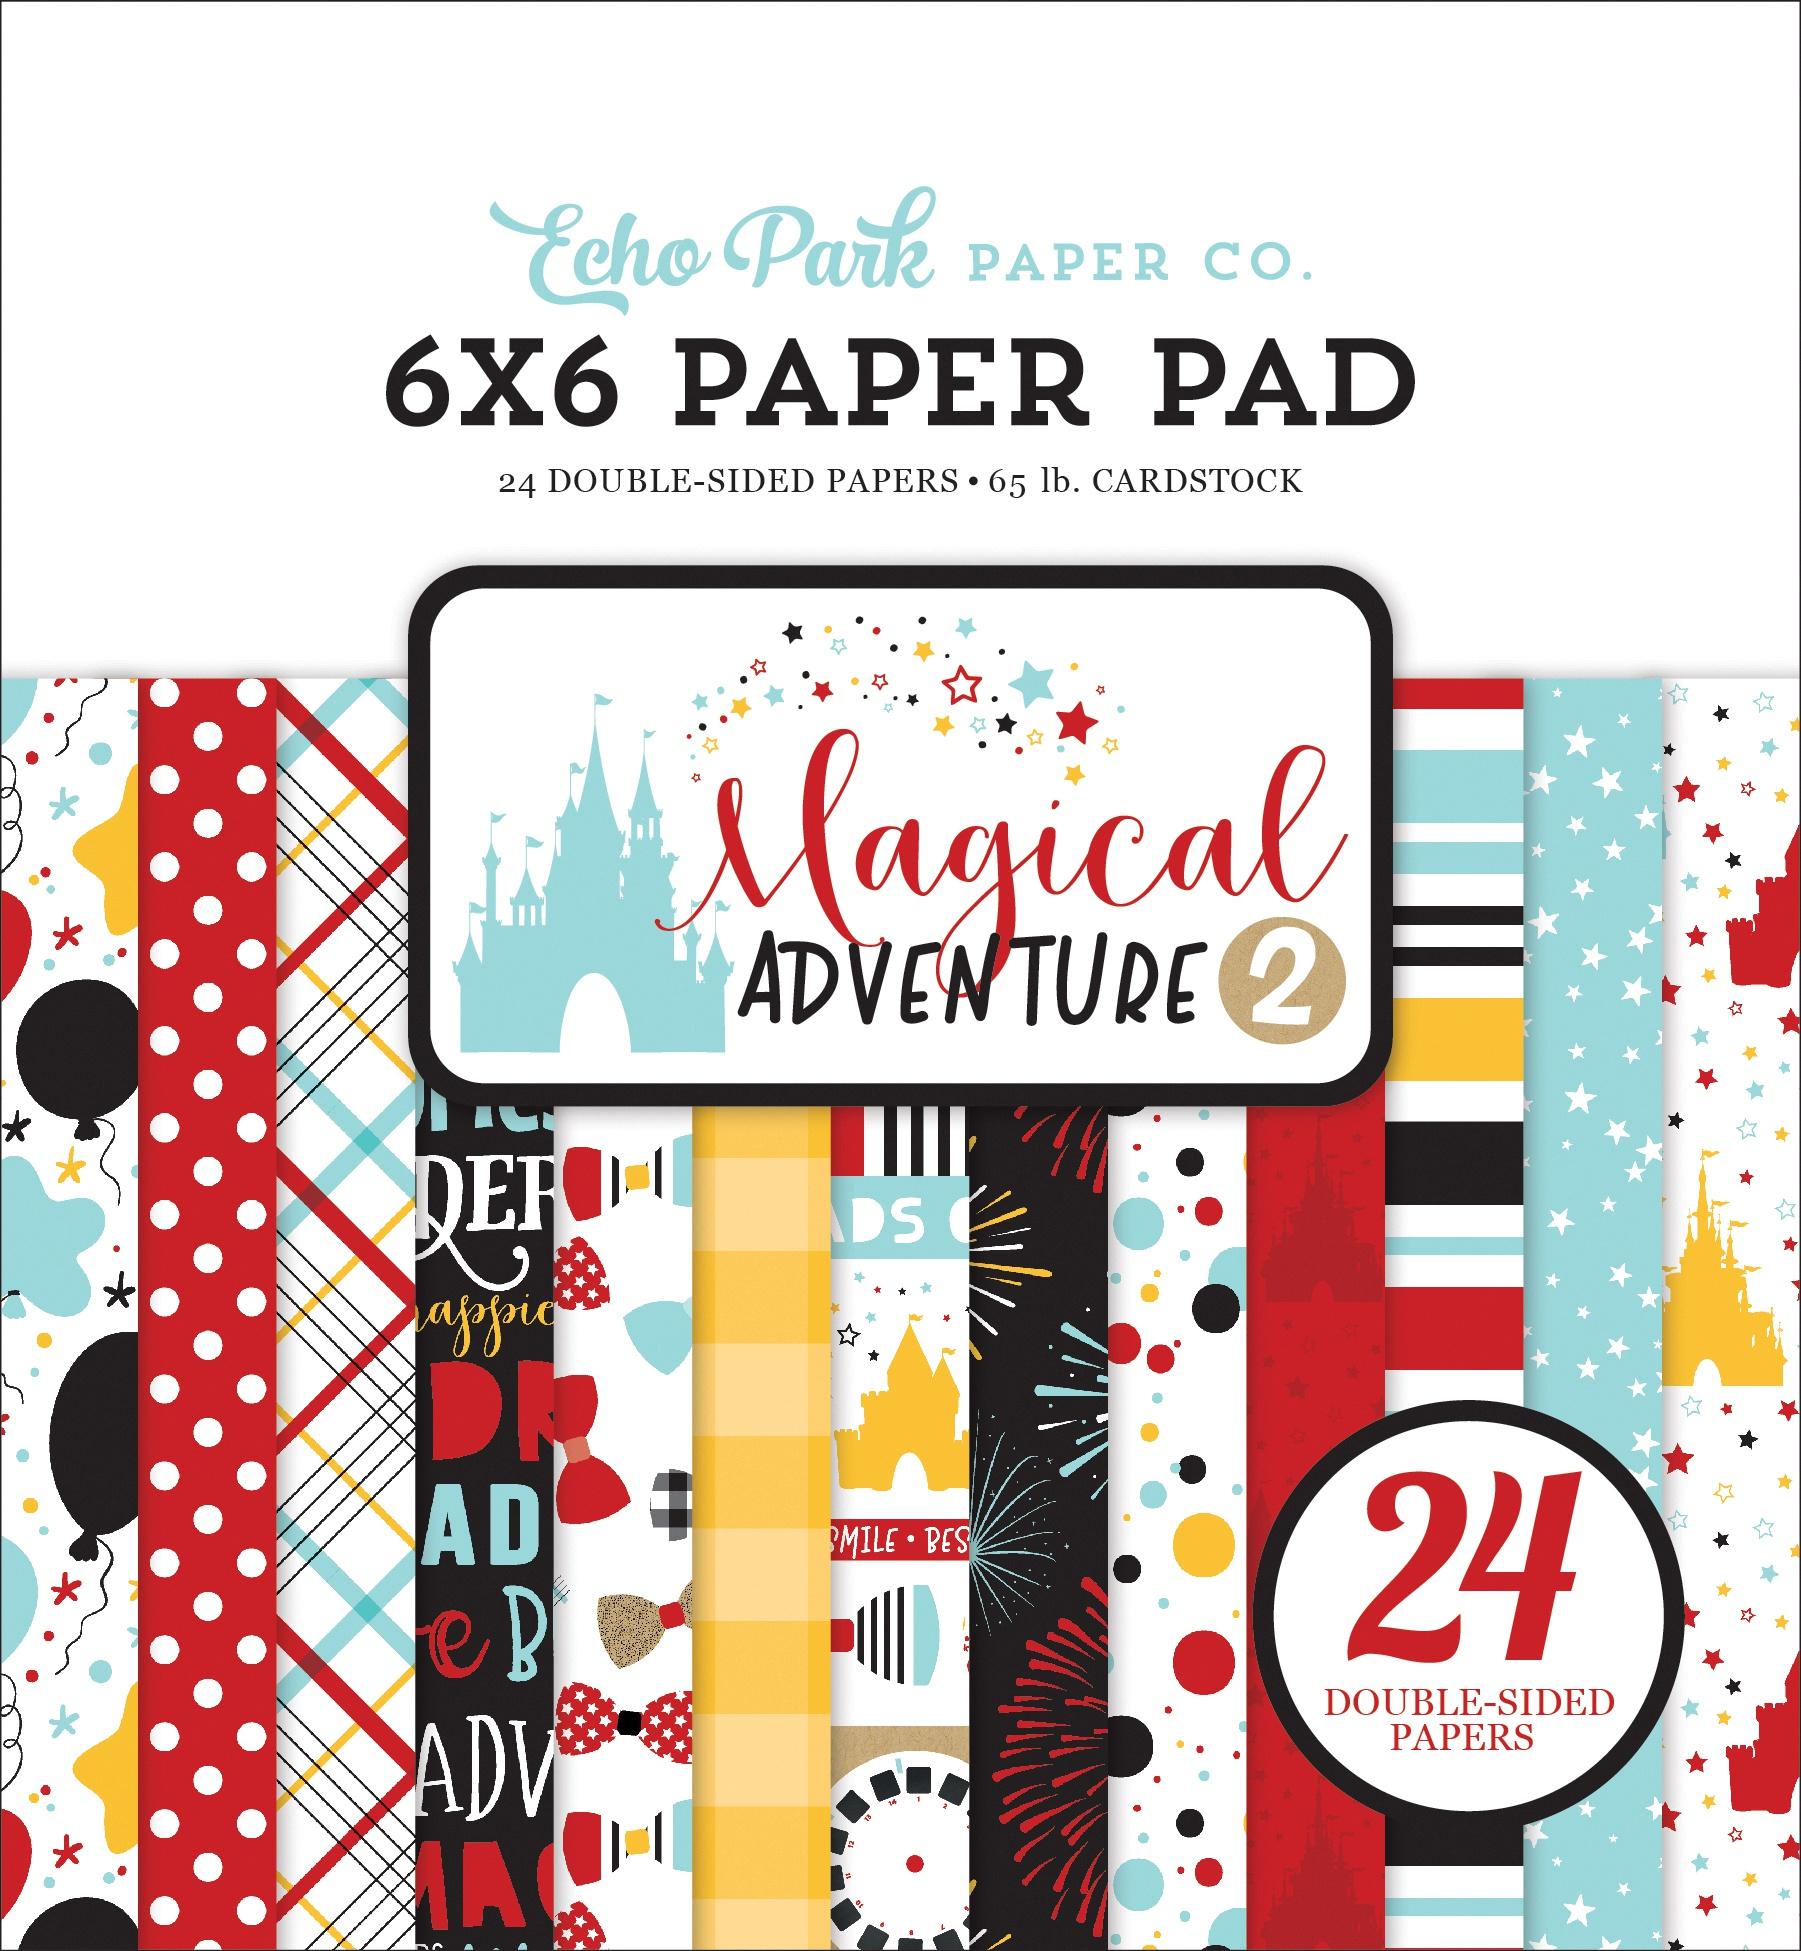 Echo Park Magical Adventure 2 Paper Pad 6x6